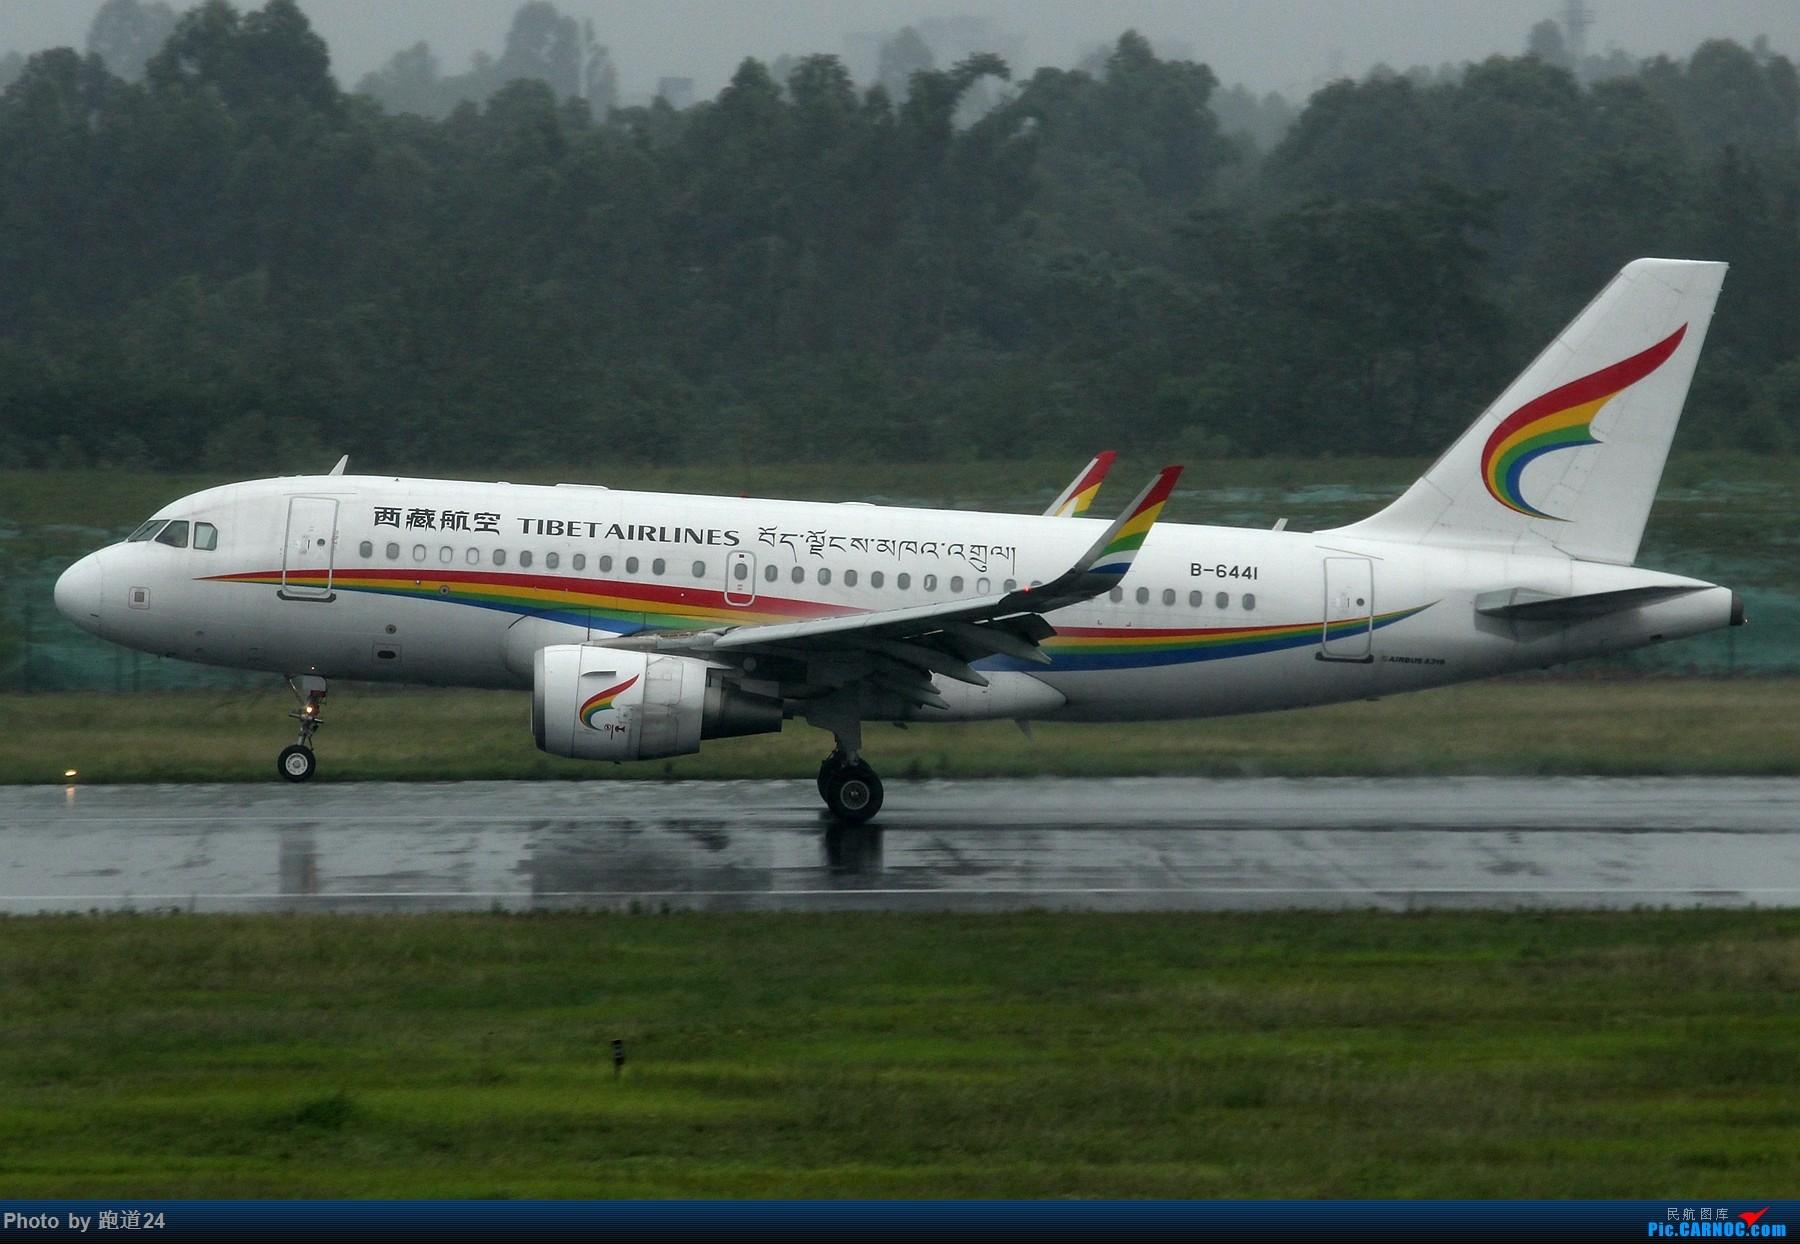 Re:[多图党]雨天CTU拍机 1800*1200 AIRBUS A319-100 B-6441 中国成都双流国际机场